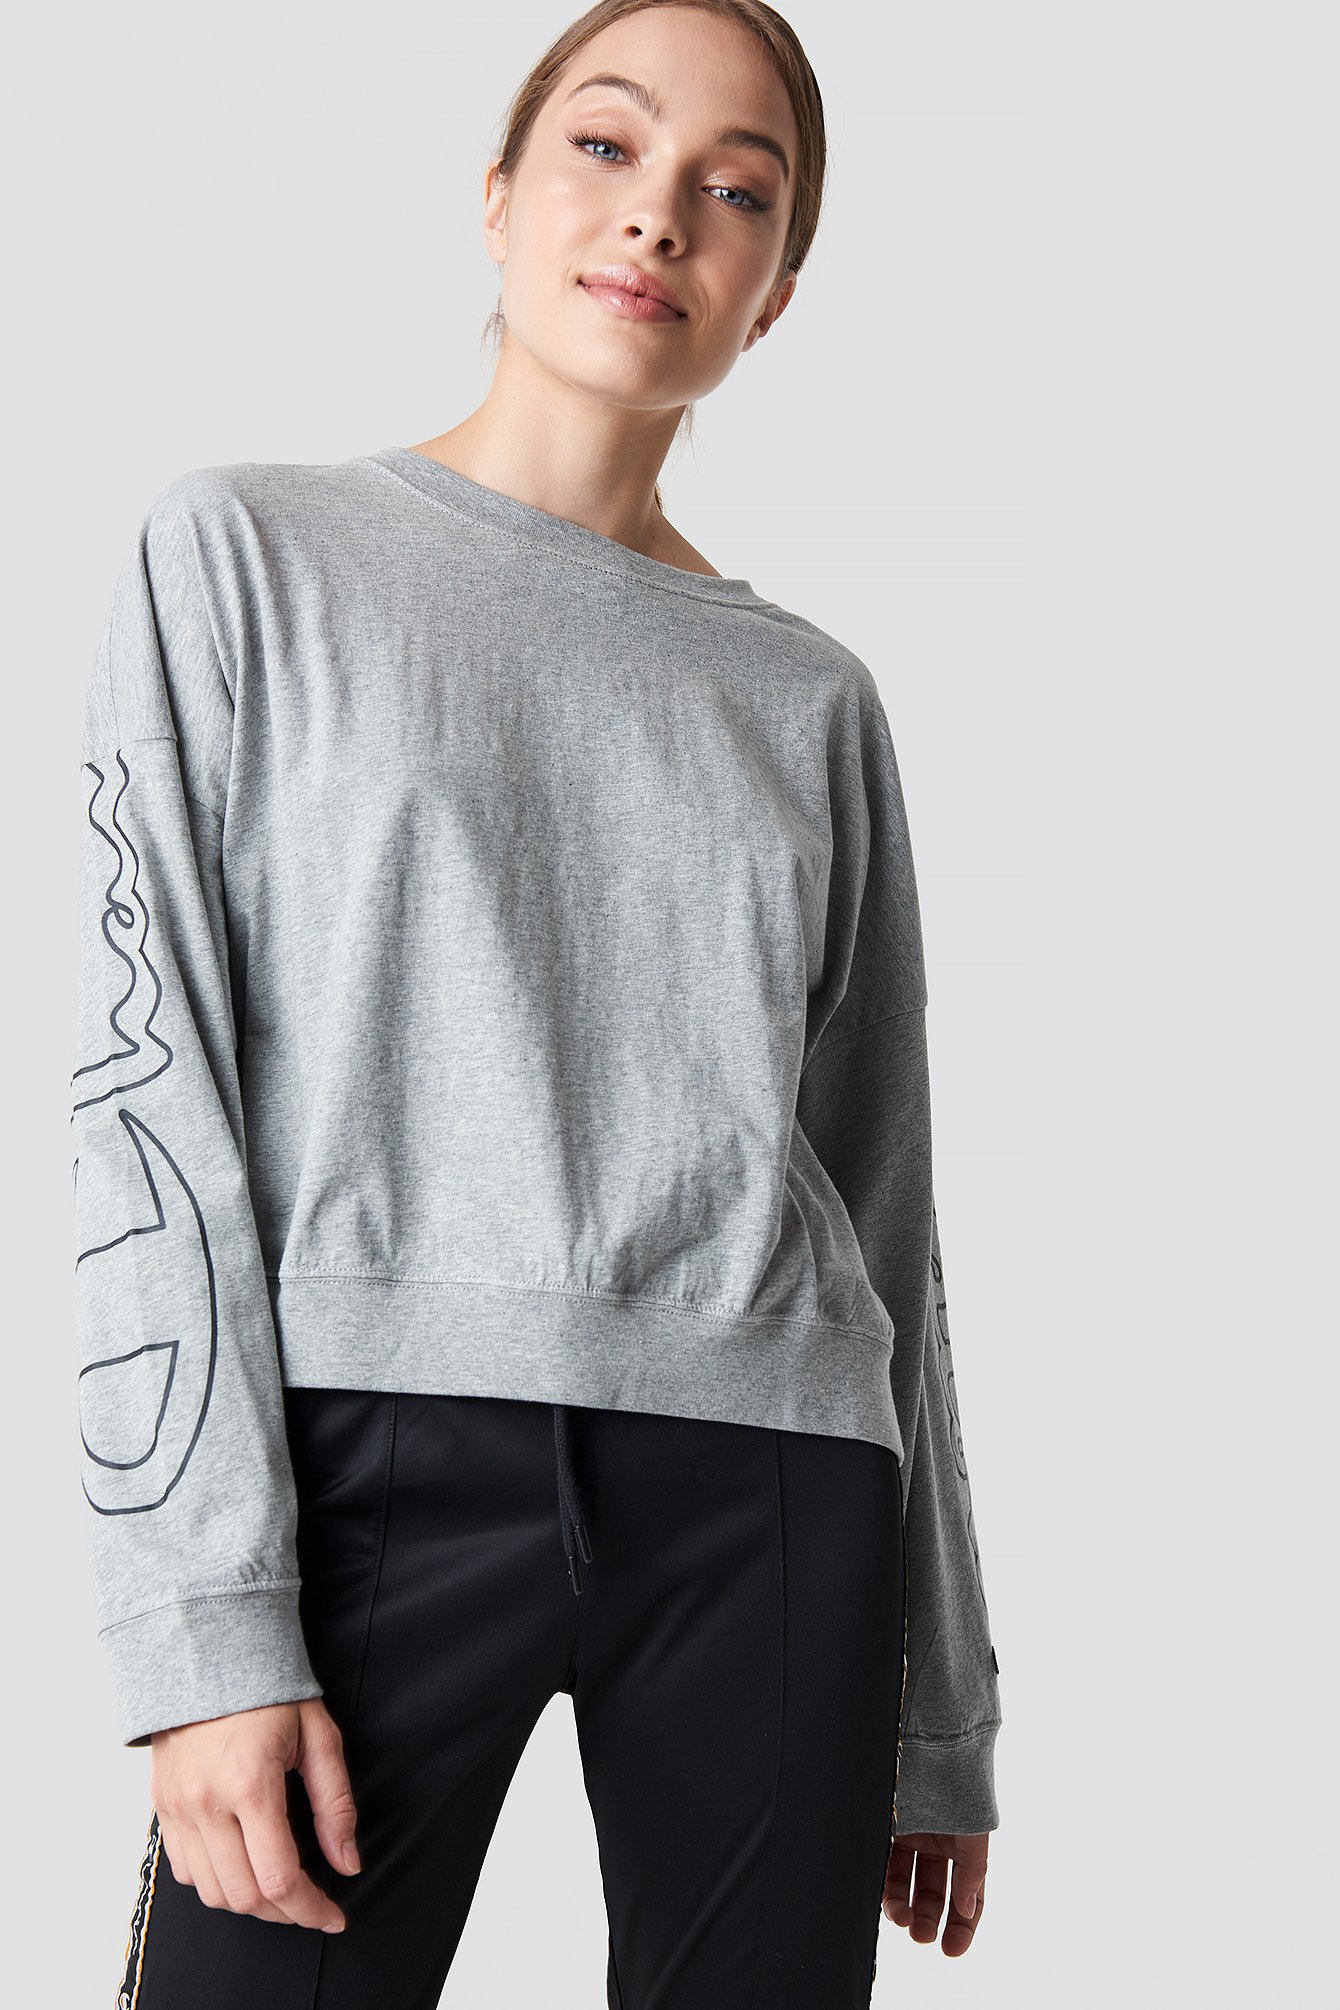 champion -  Crewneck T-Shirt 111234 - Grey